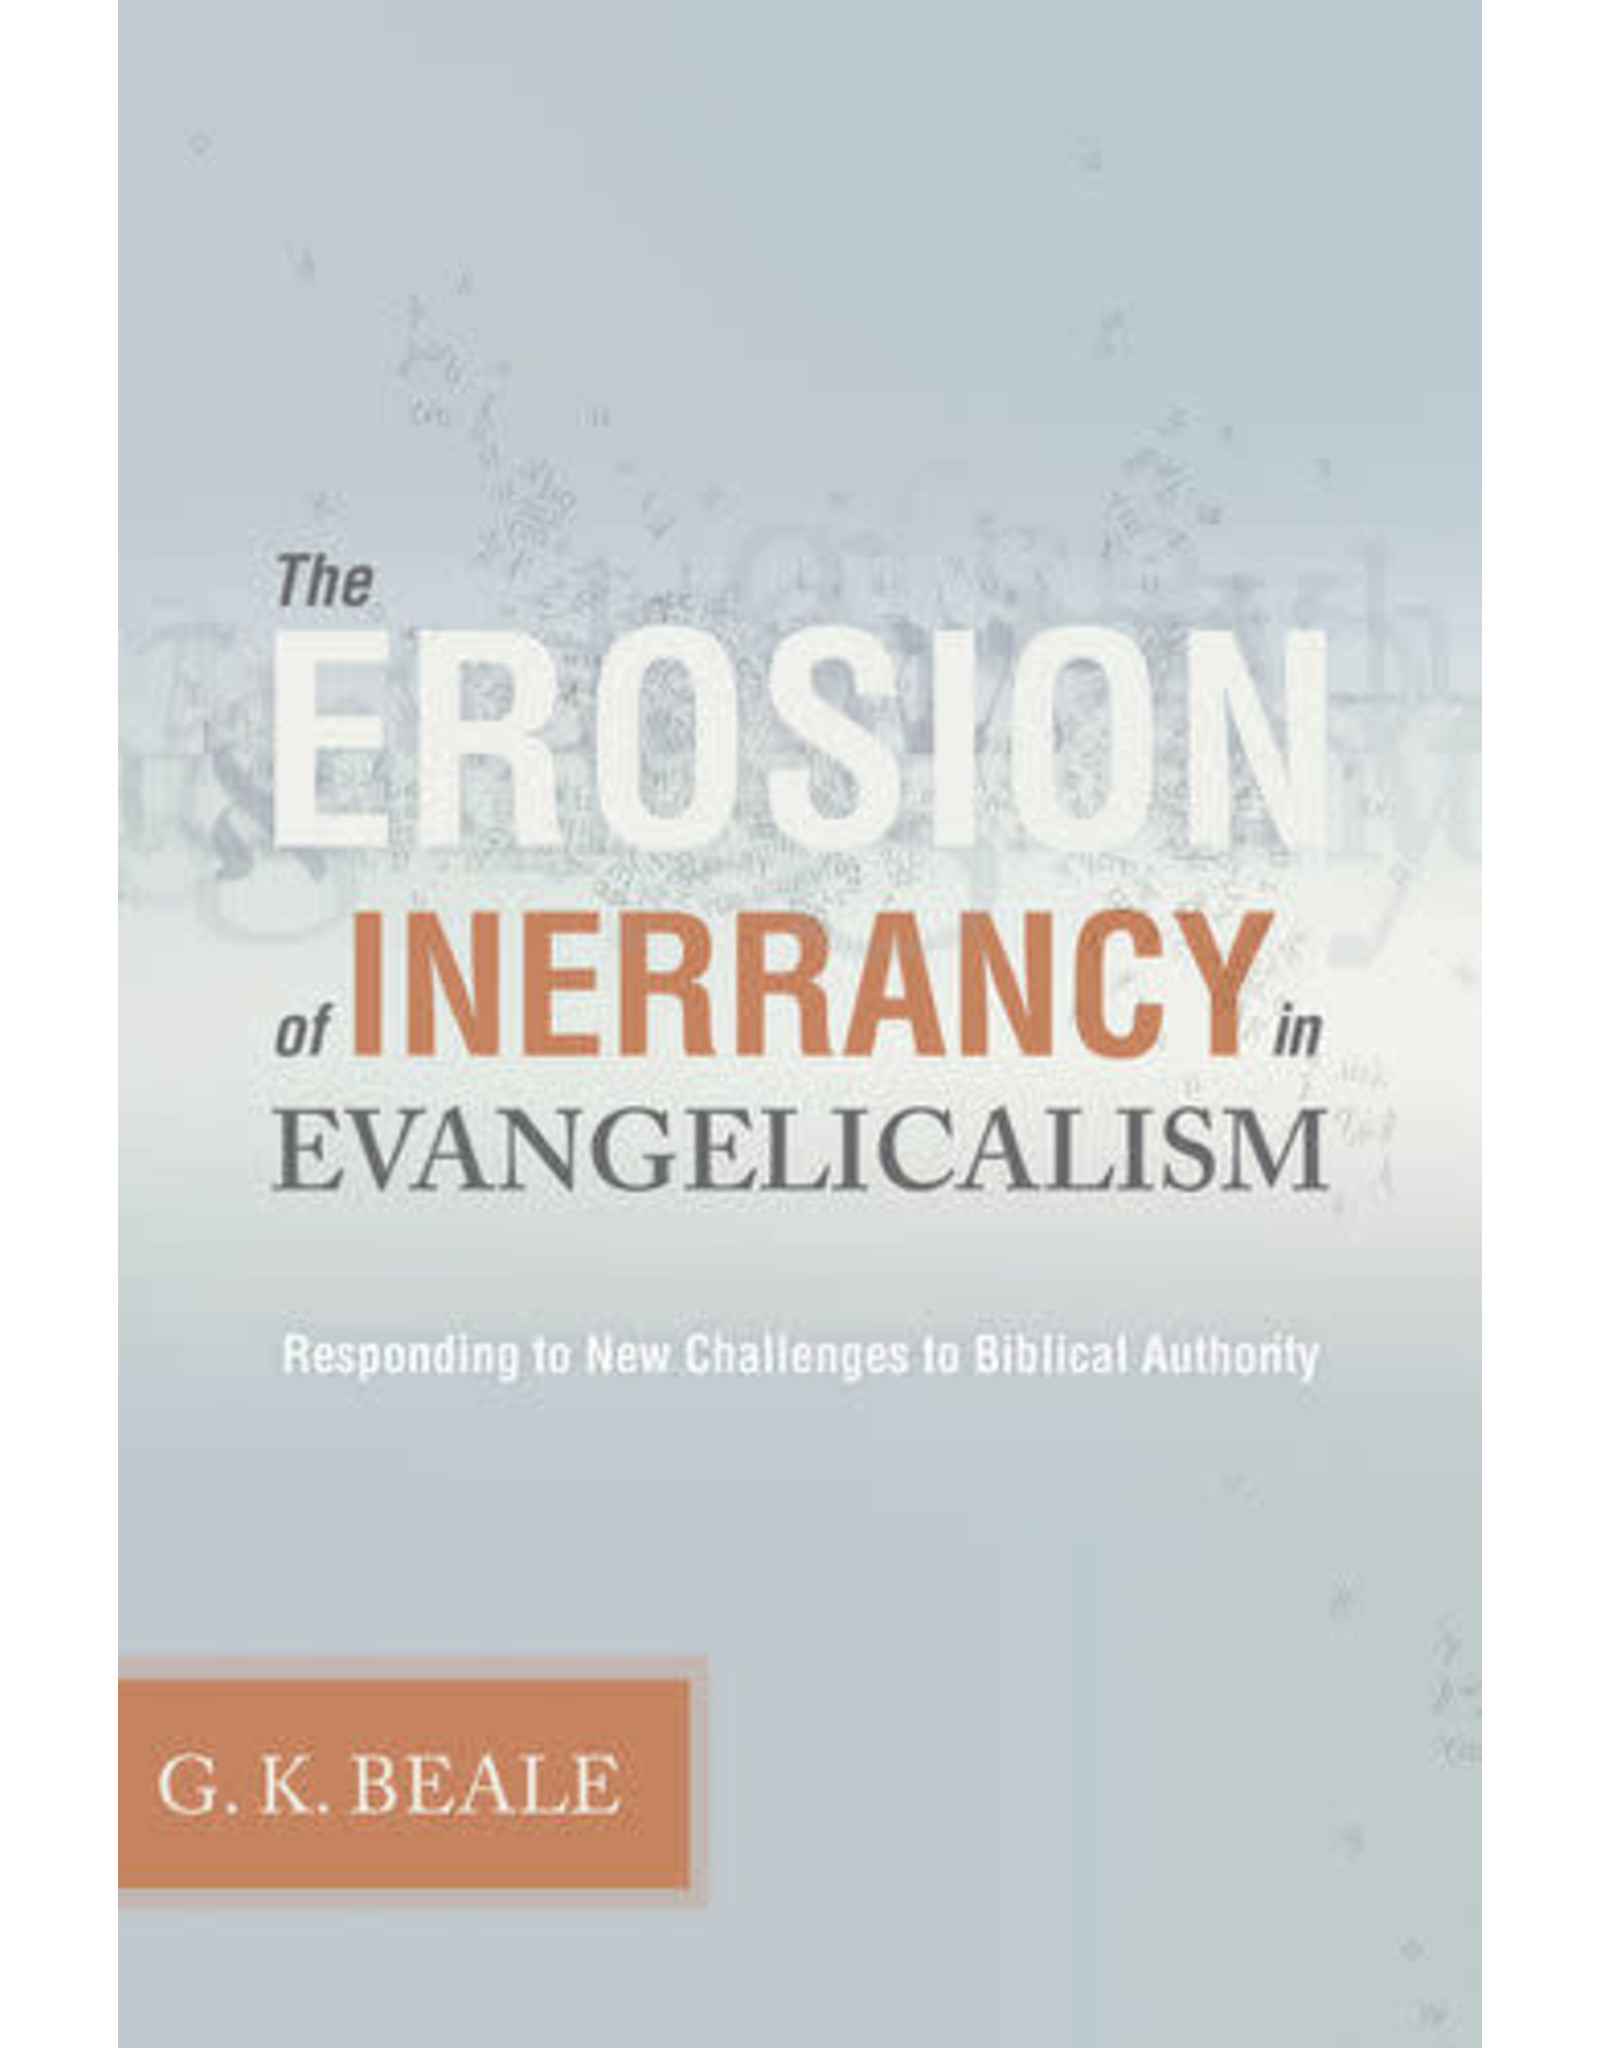 Beale The Erosion of Inerrancy in Evangelicalism